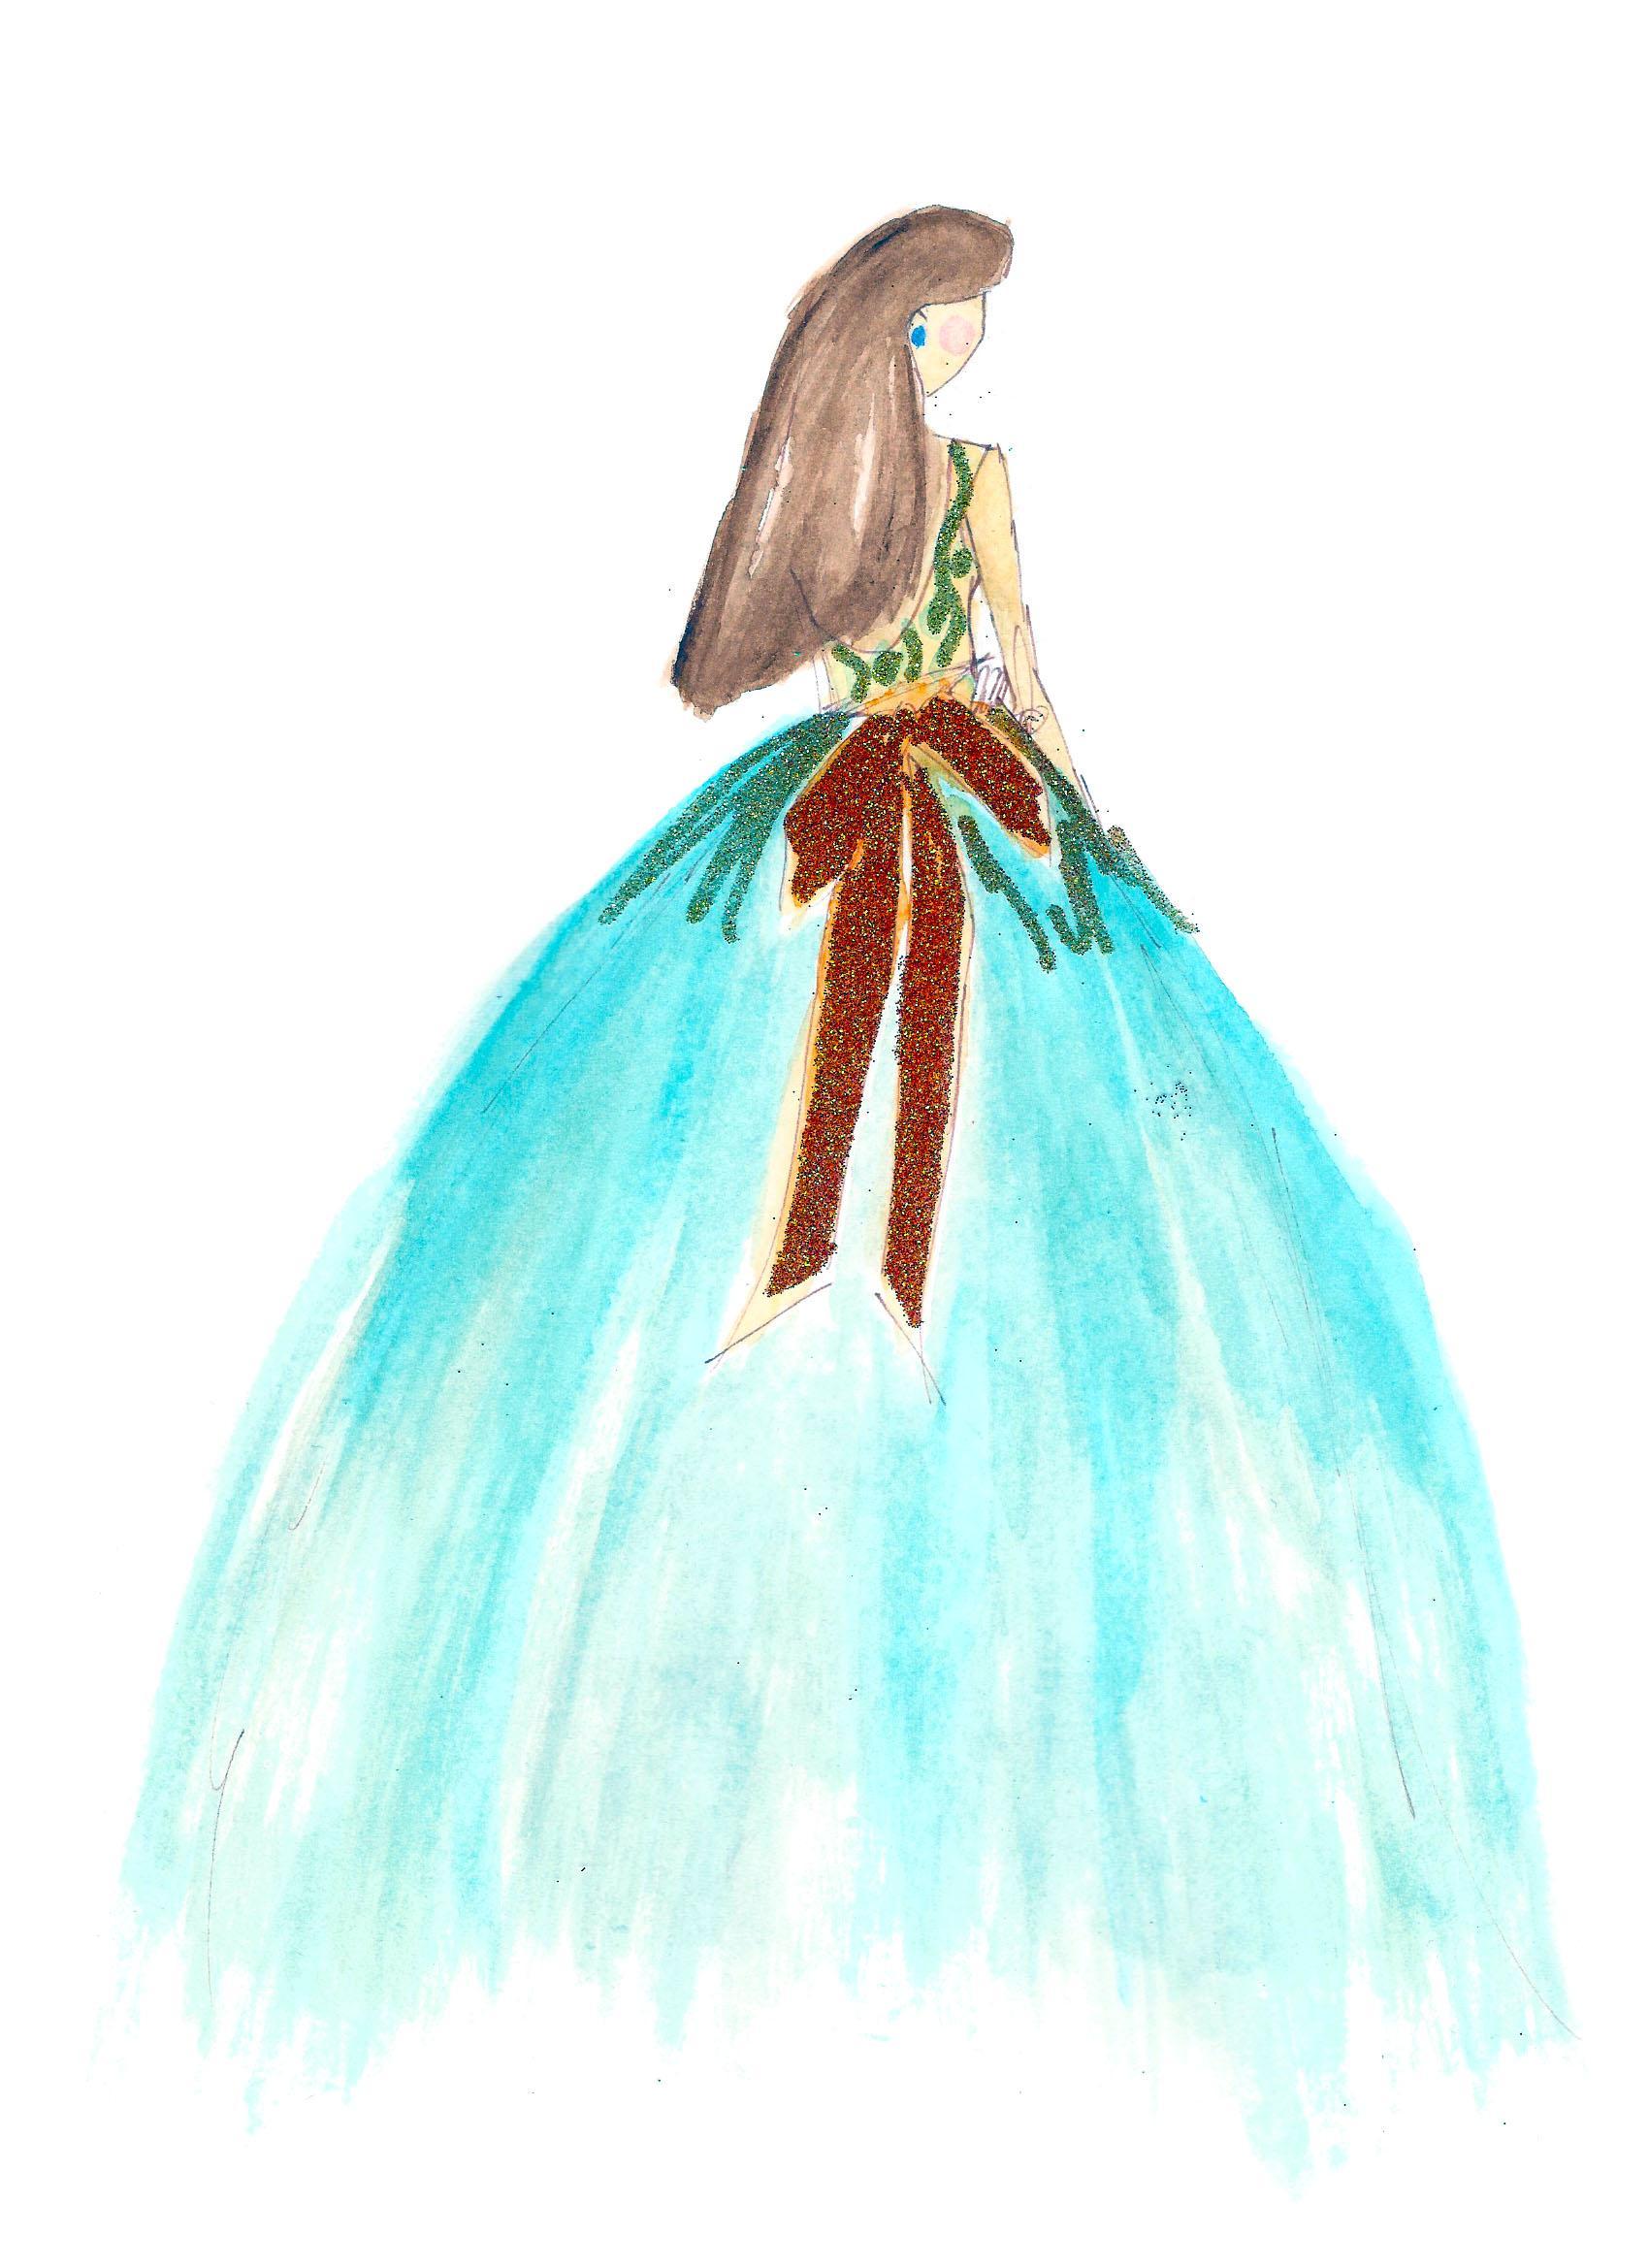 FINAL embellishment/watercolor Melissa Nadine fashion illustration - image 4 - student project